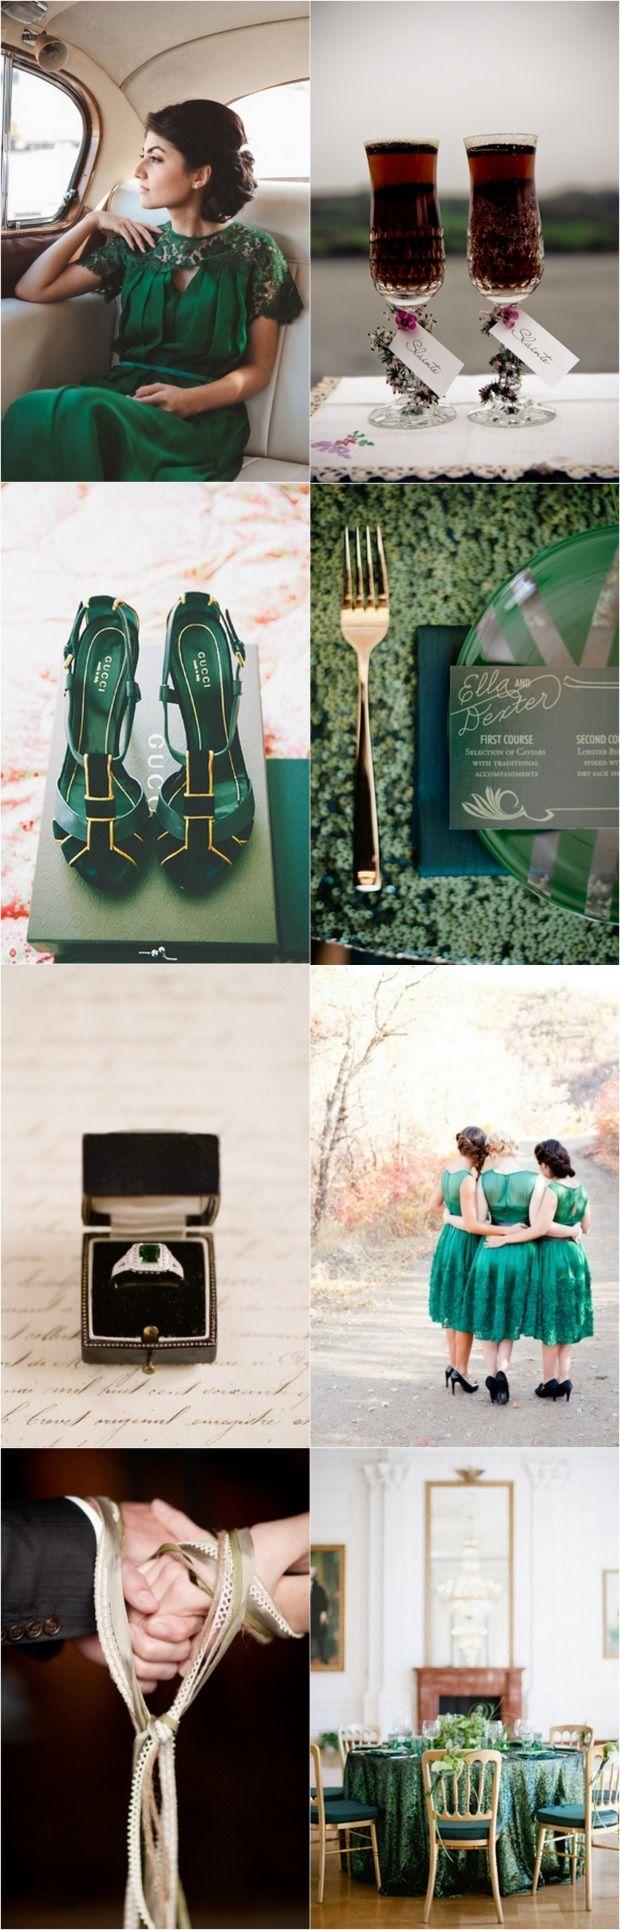 Irish businesses on Pinterest - Weddings Online the forum and directory site for Irish weddings on Pinterest